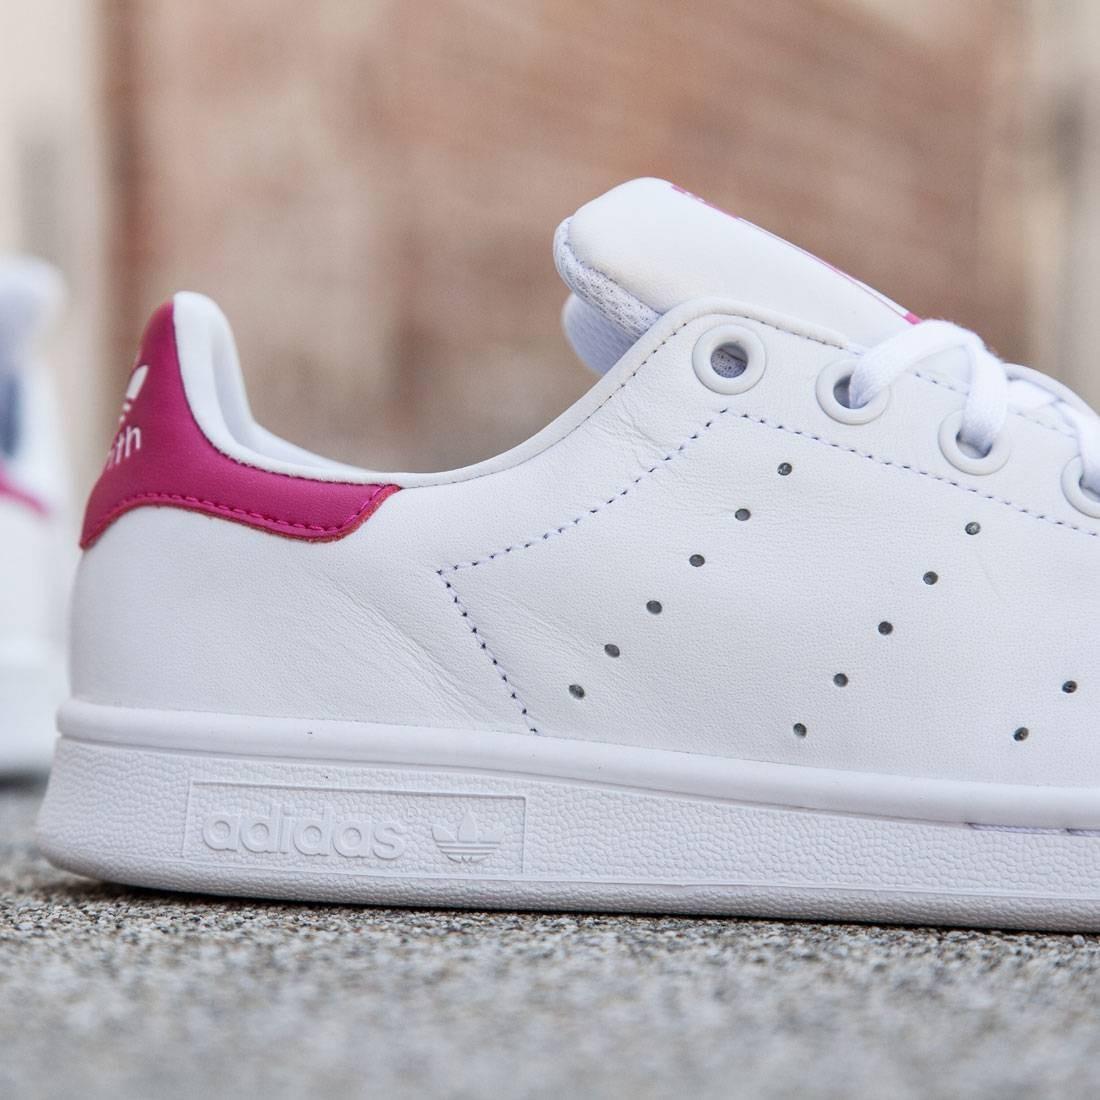 sports shoes 3b0dc 0b462 Adidas Big Kids Stan Smith (white/ footwear white / bold pink)